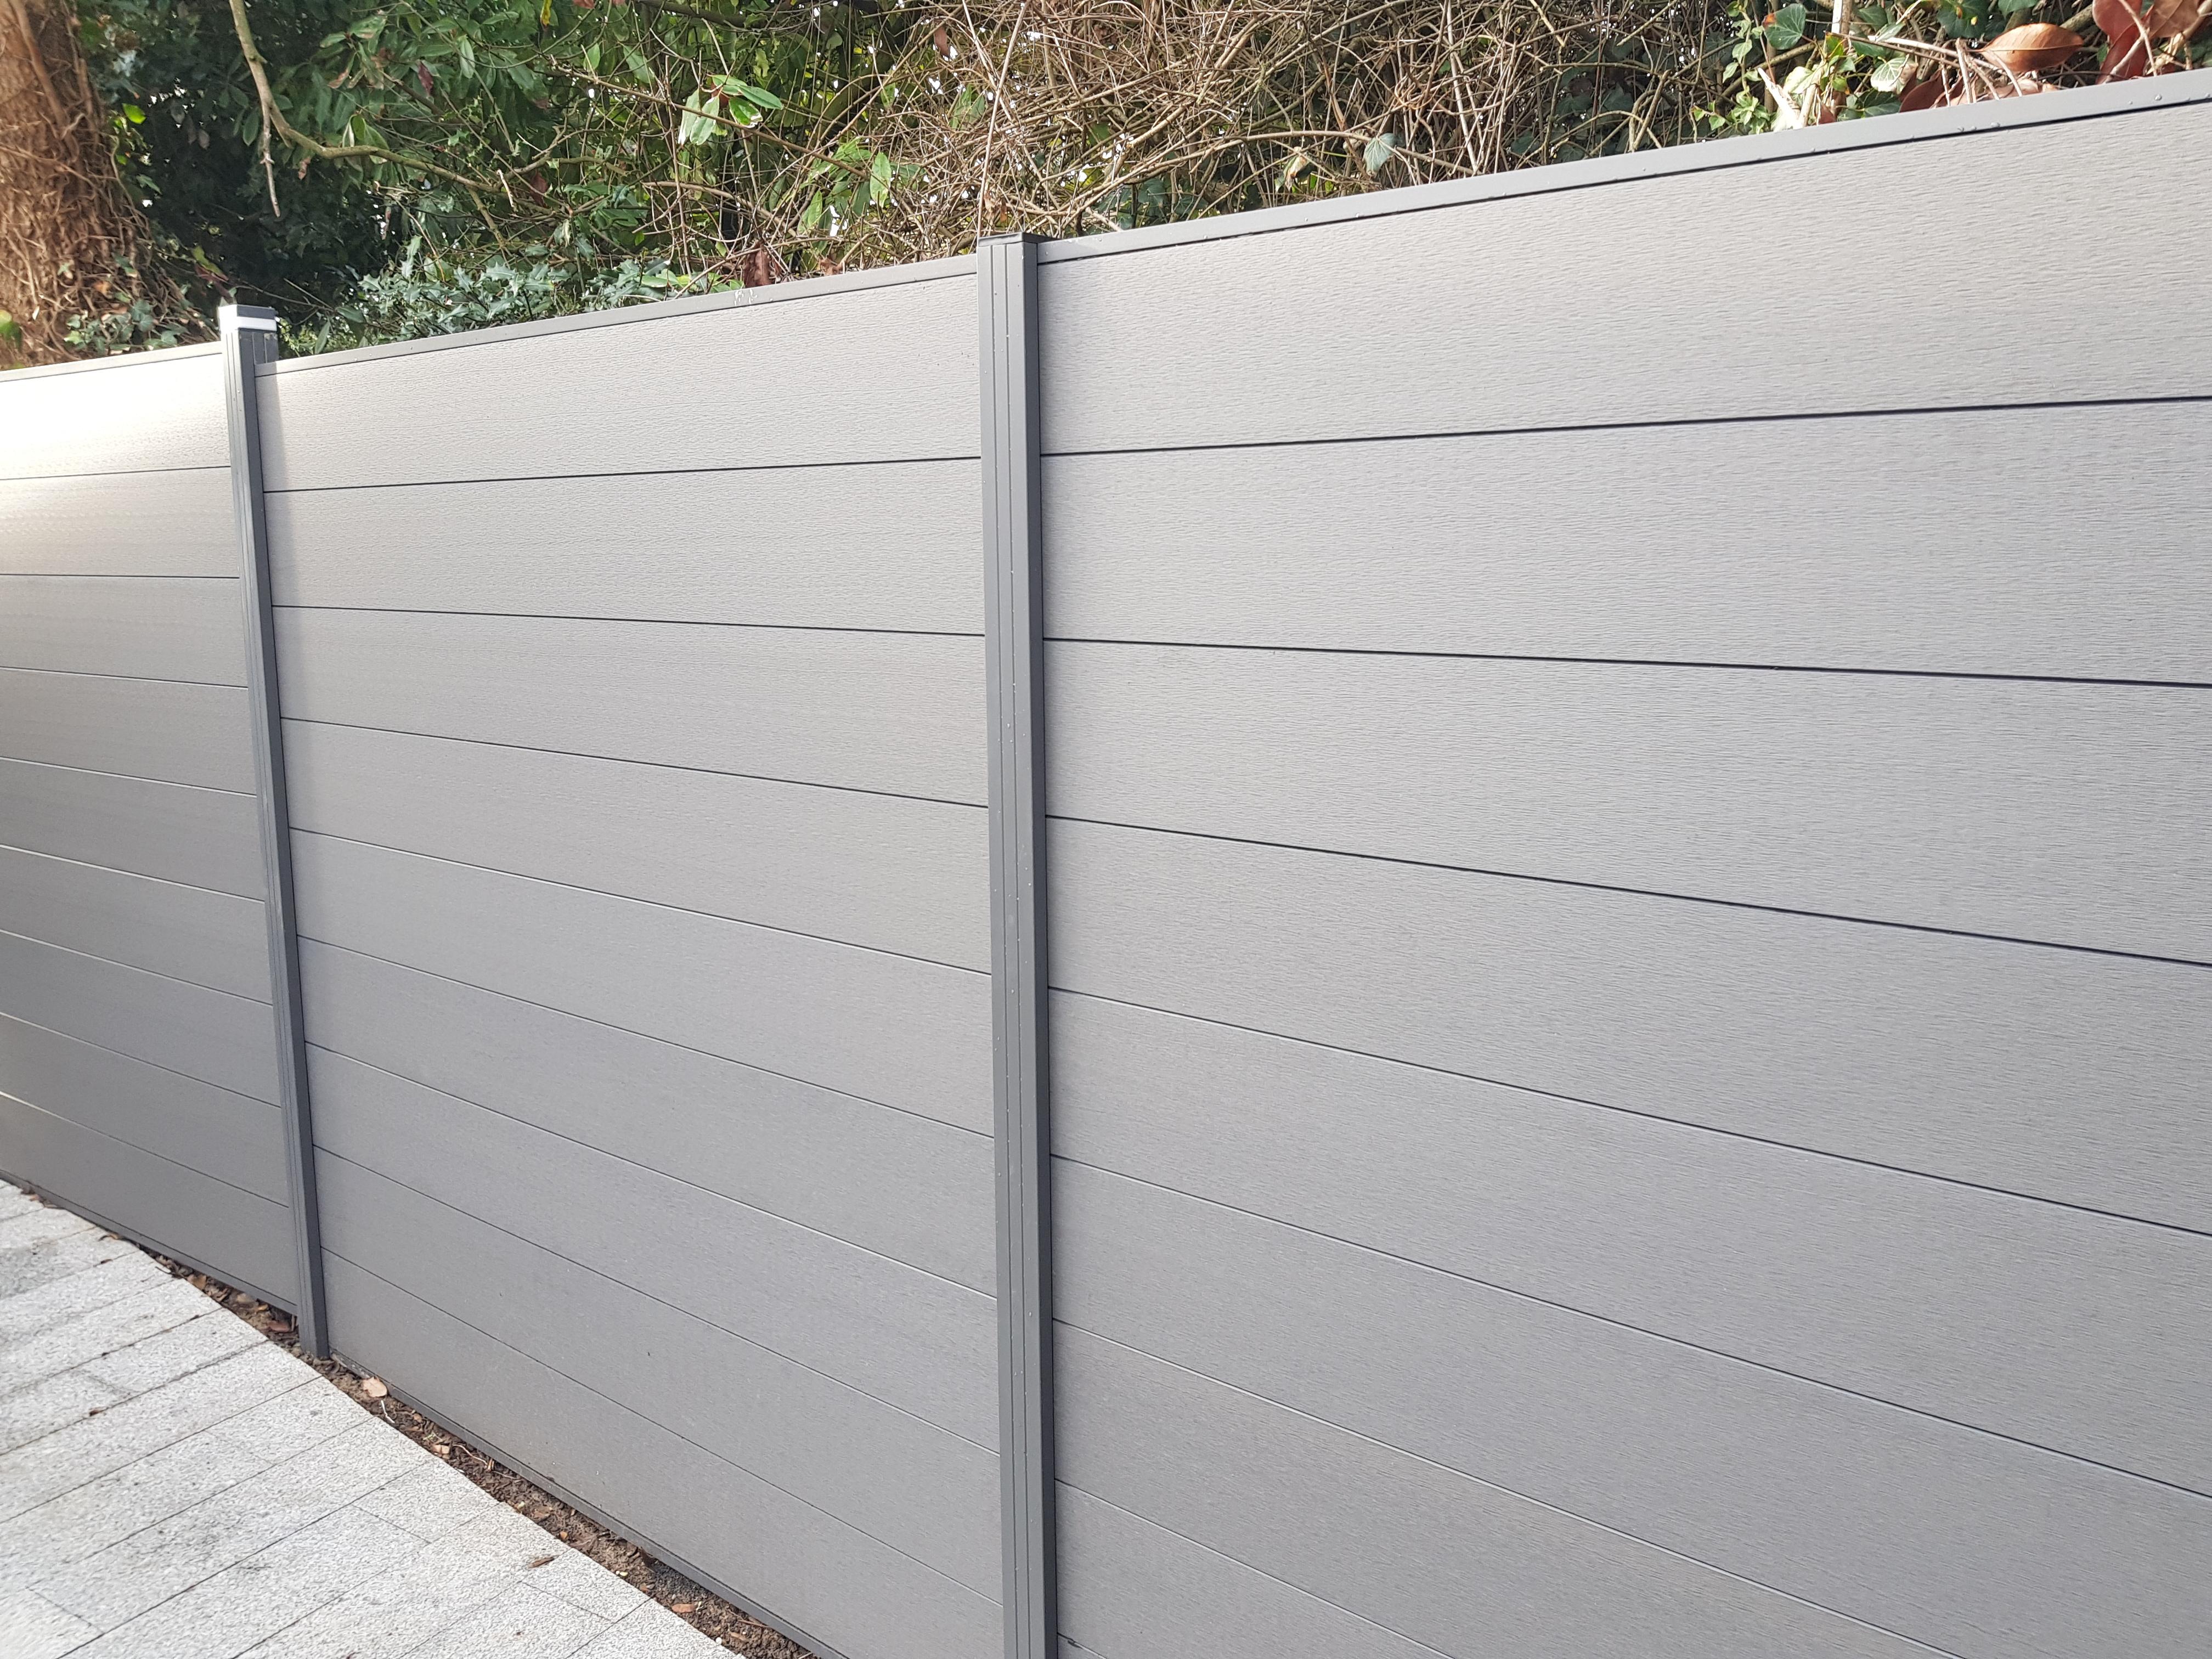 Corrosion free fencing